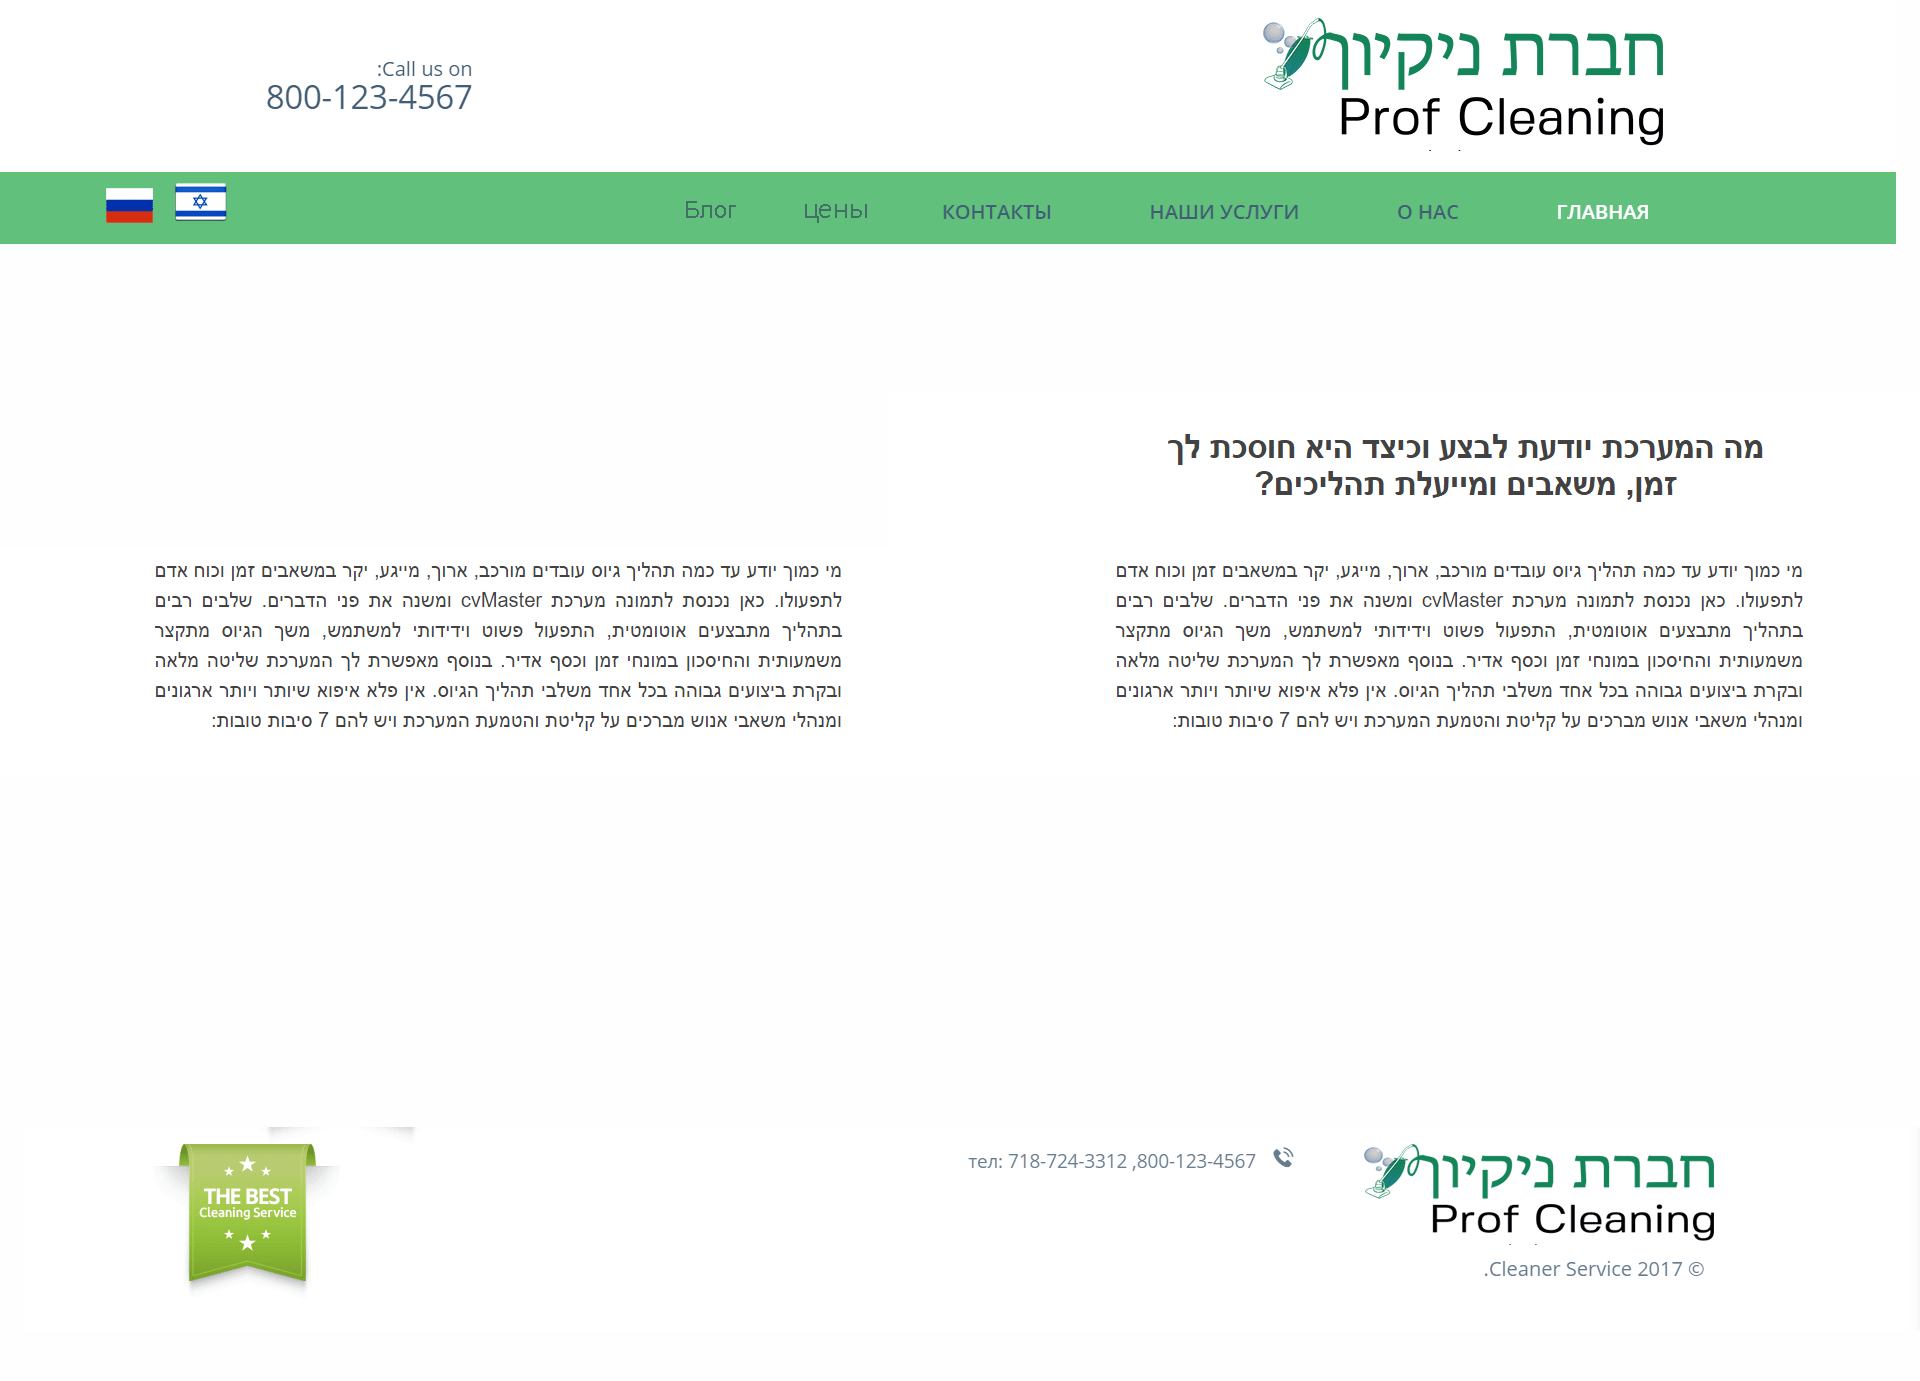 сайт визитка под ключ